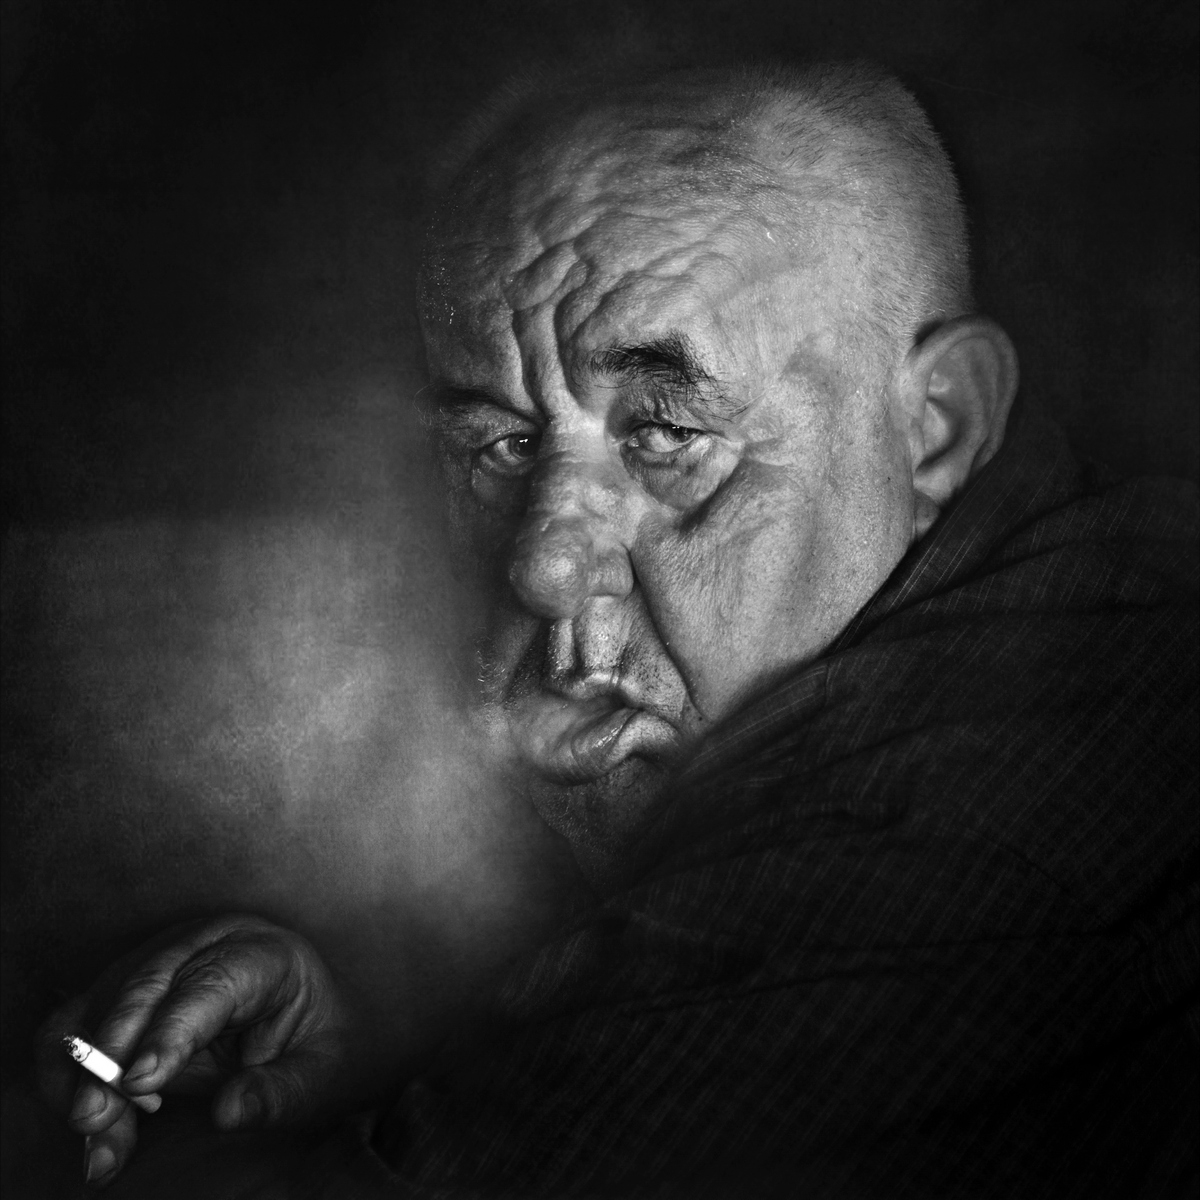 Ranko Djurovic - Photgraphic Works